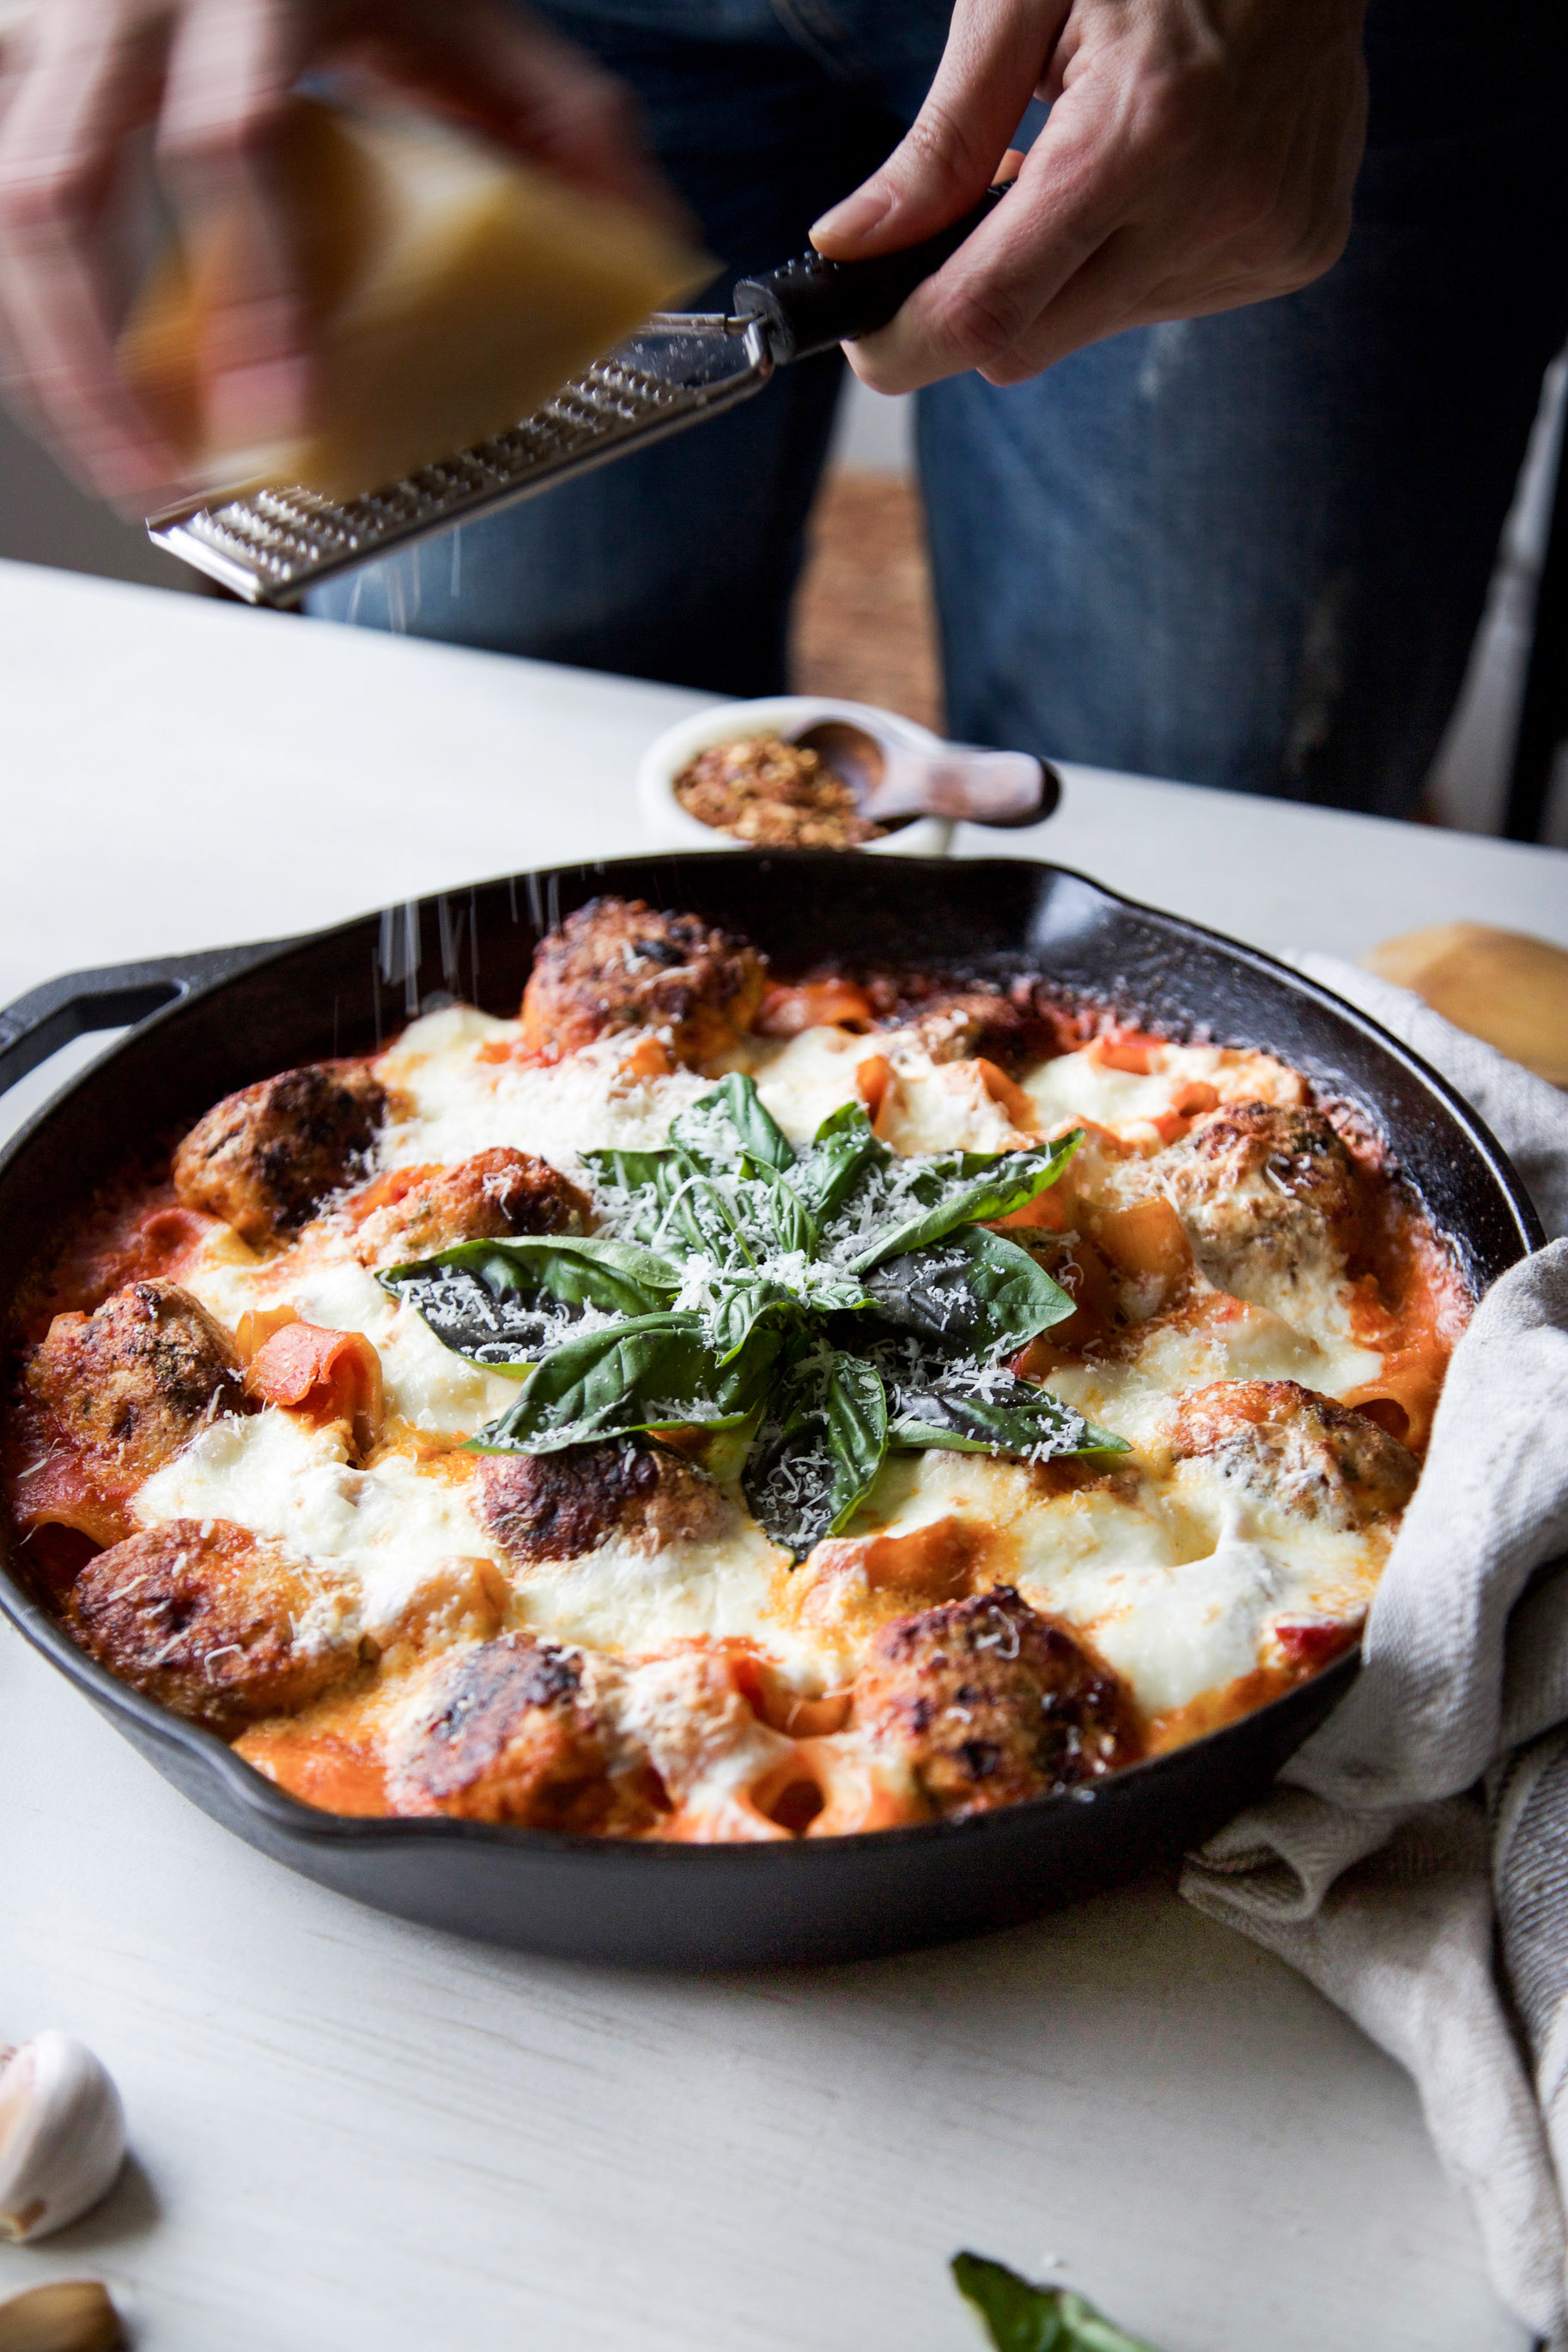 One-Pan-Chicken-Parm-Meatball-Burrata-Pasta-Bake5.jpg